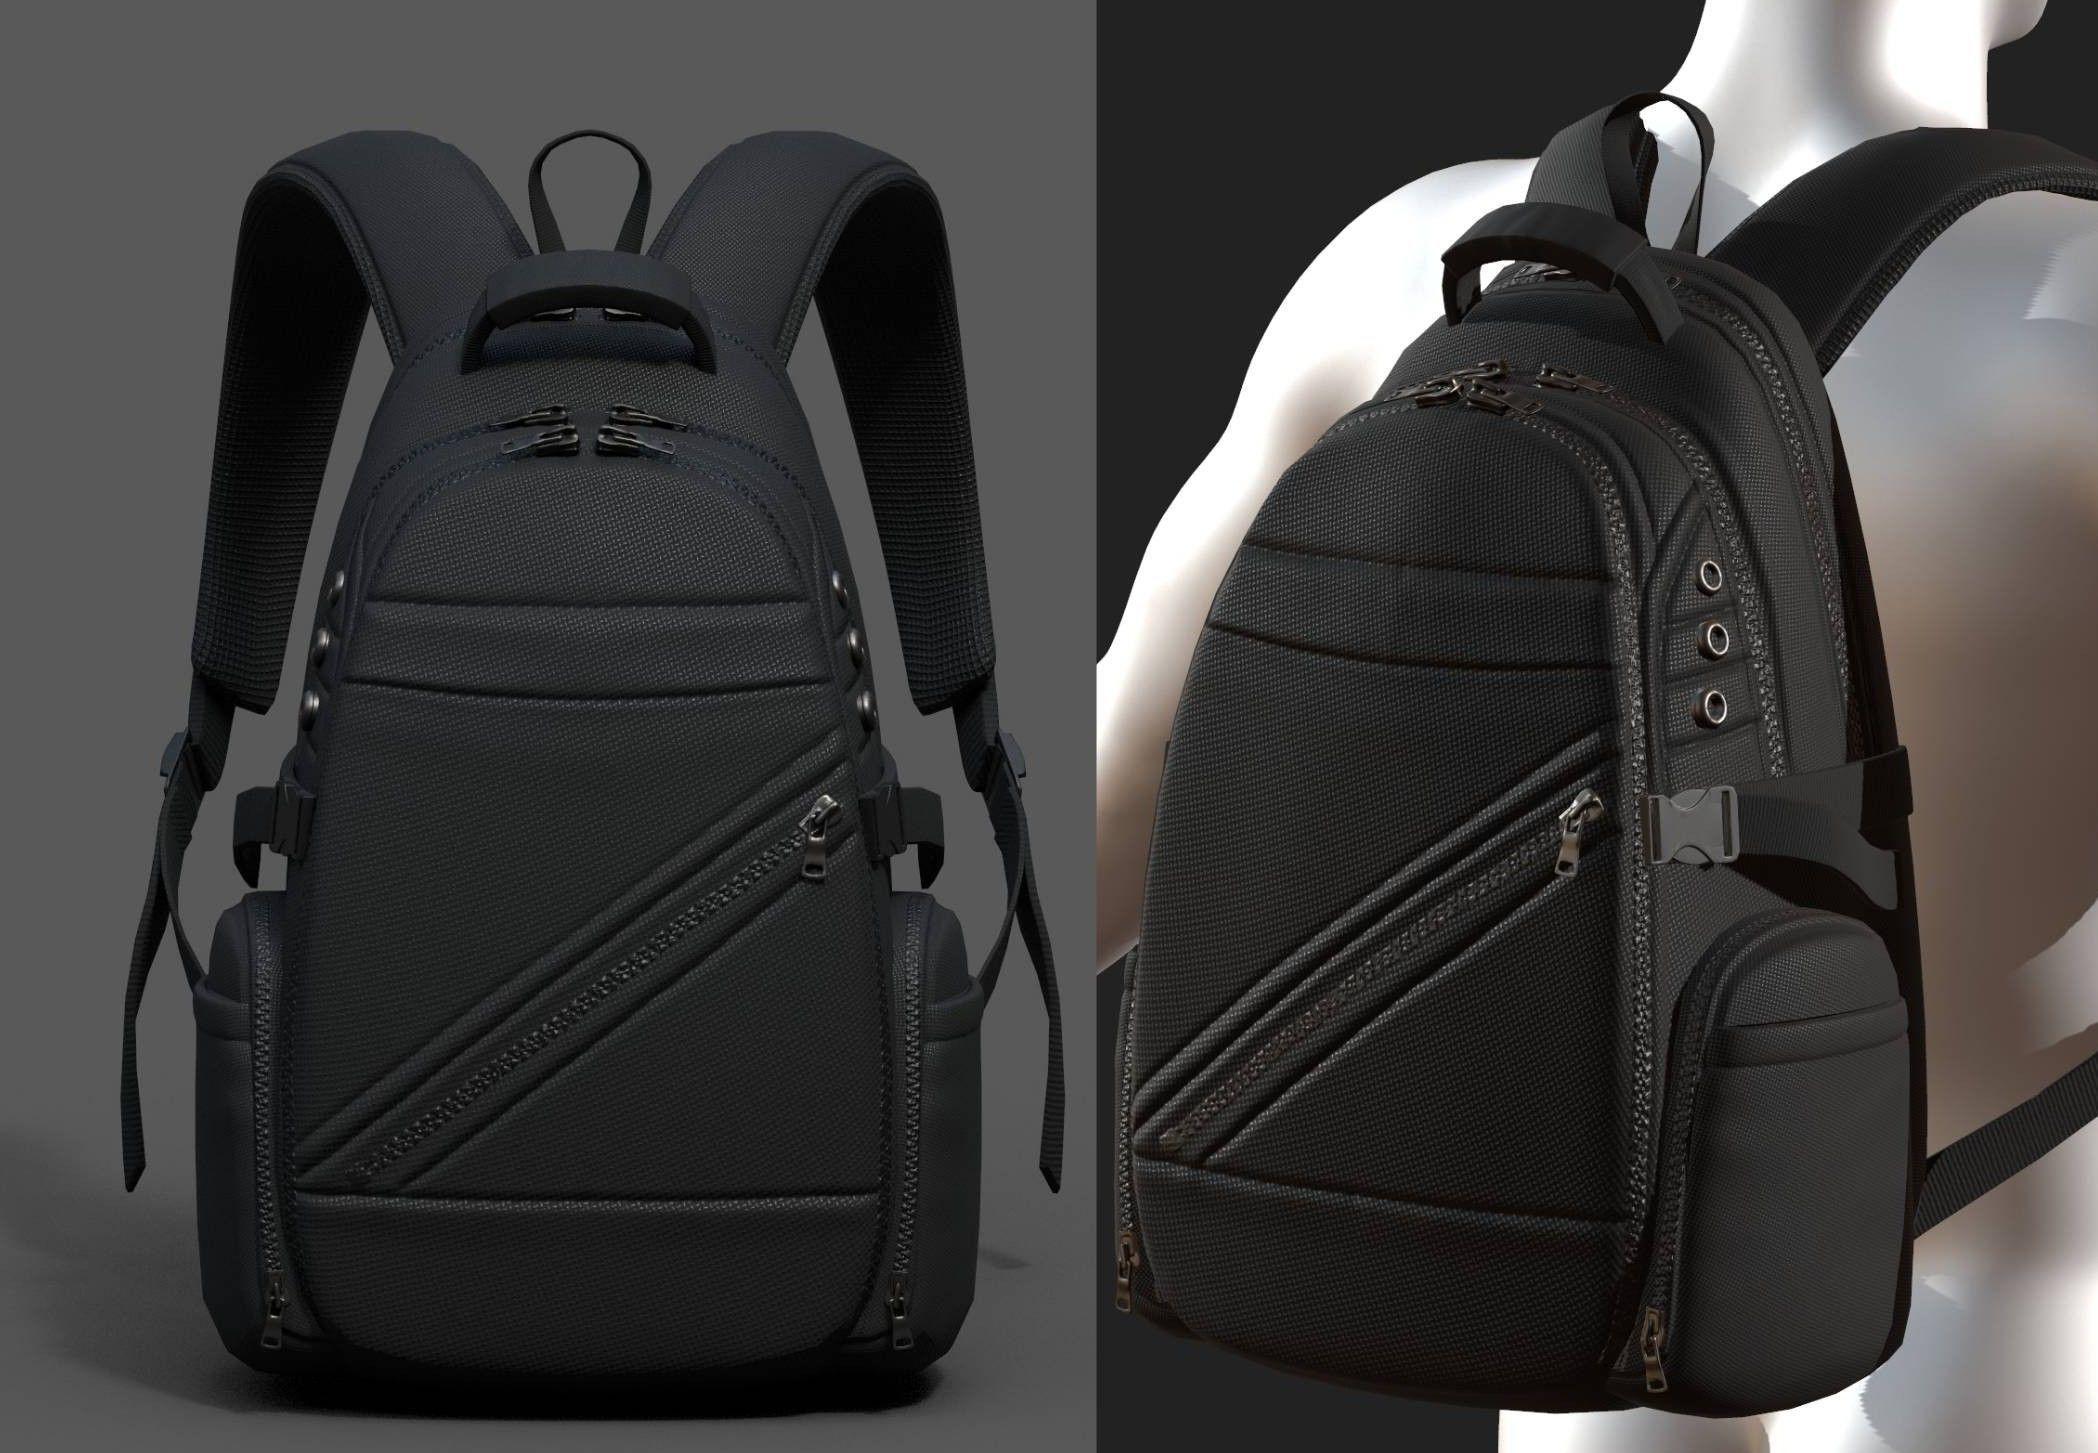 Backpack Camping Generic military human bag storqge baggage